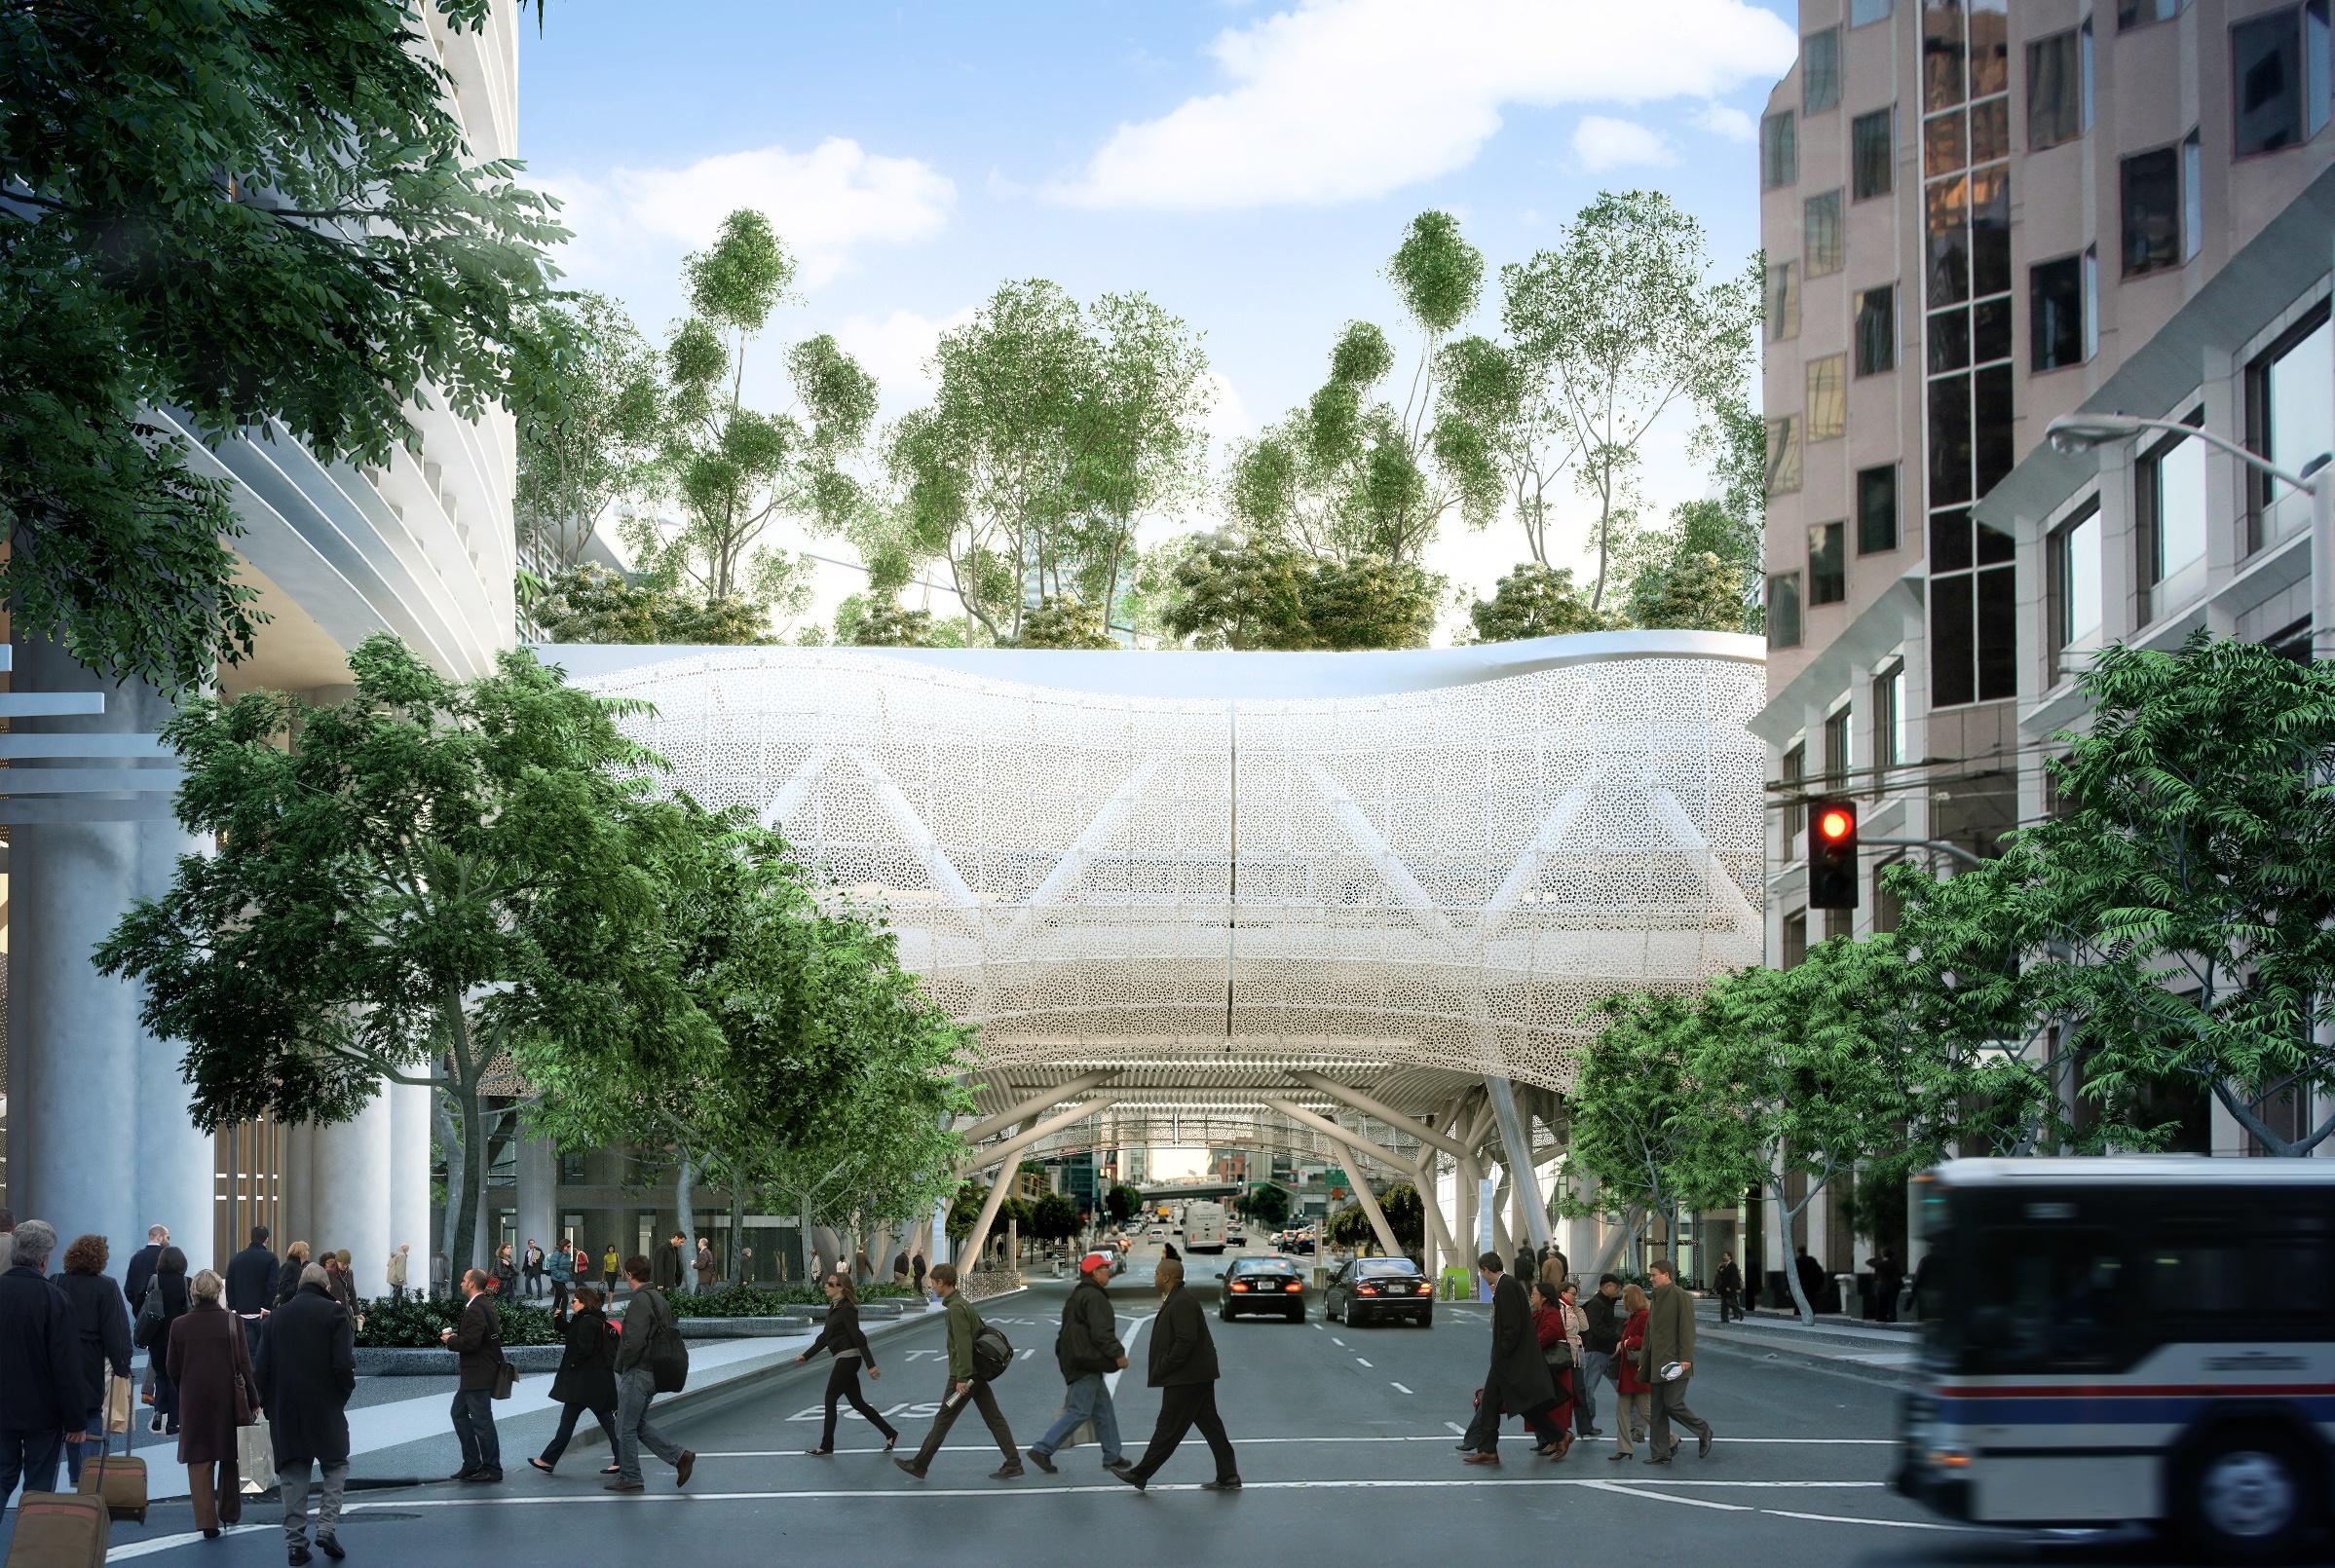 Transit Center Architecture Transbay Center